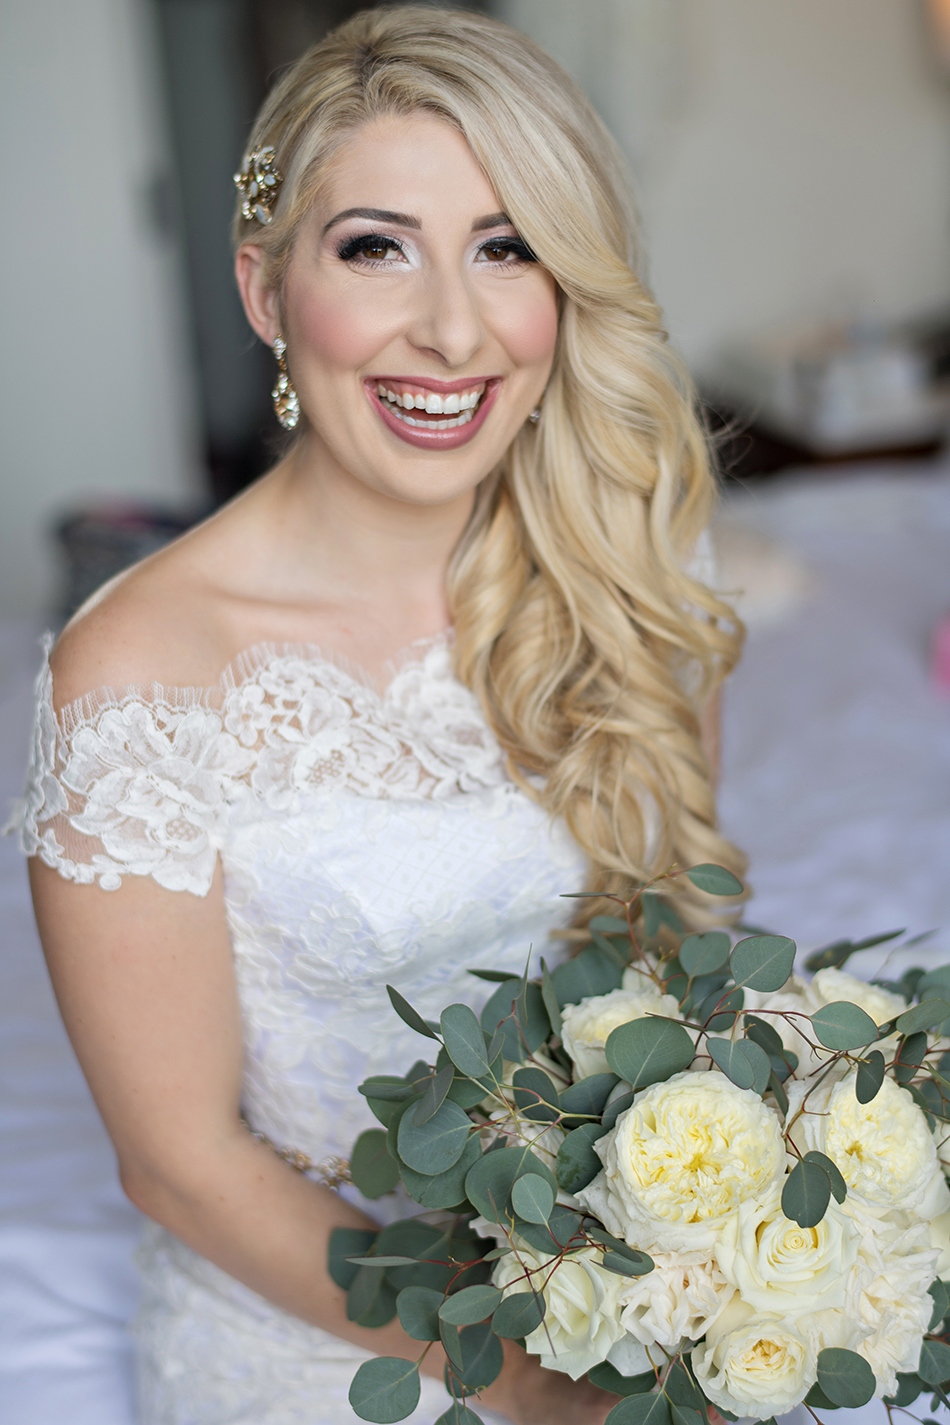 Glamorous wedding day hair and makeup